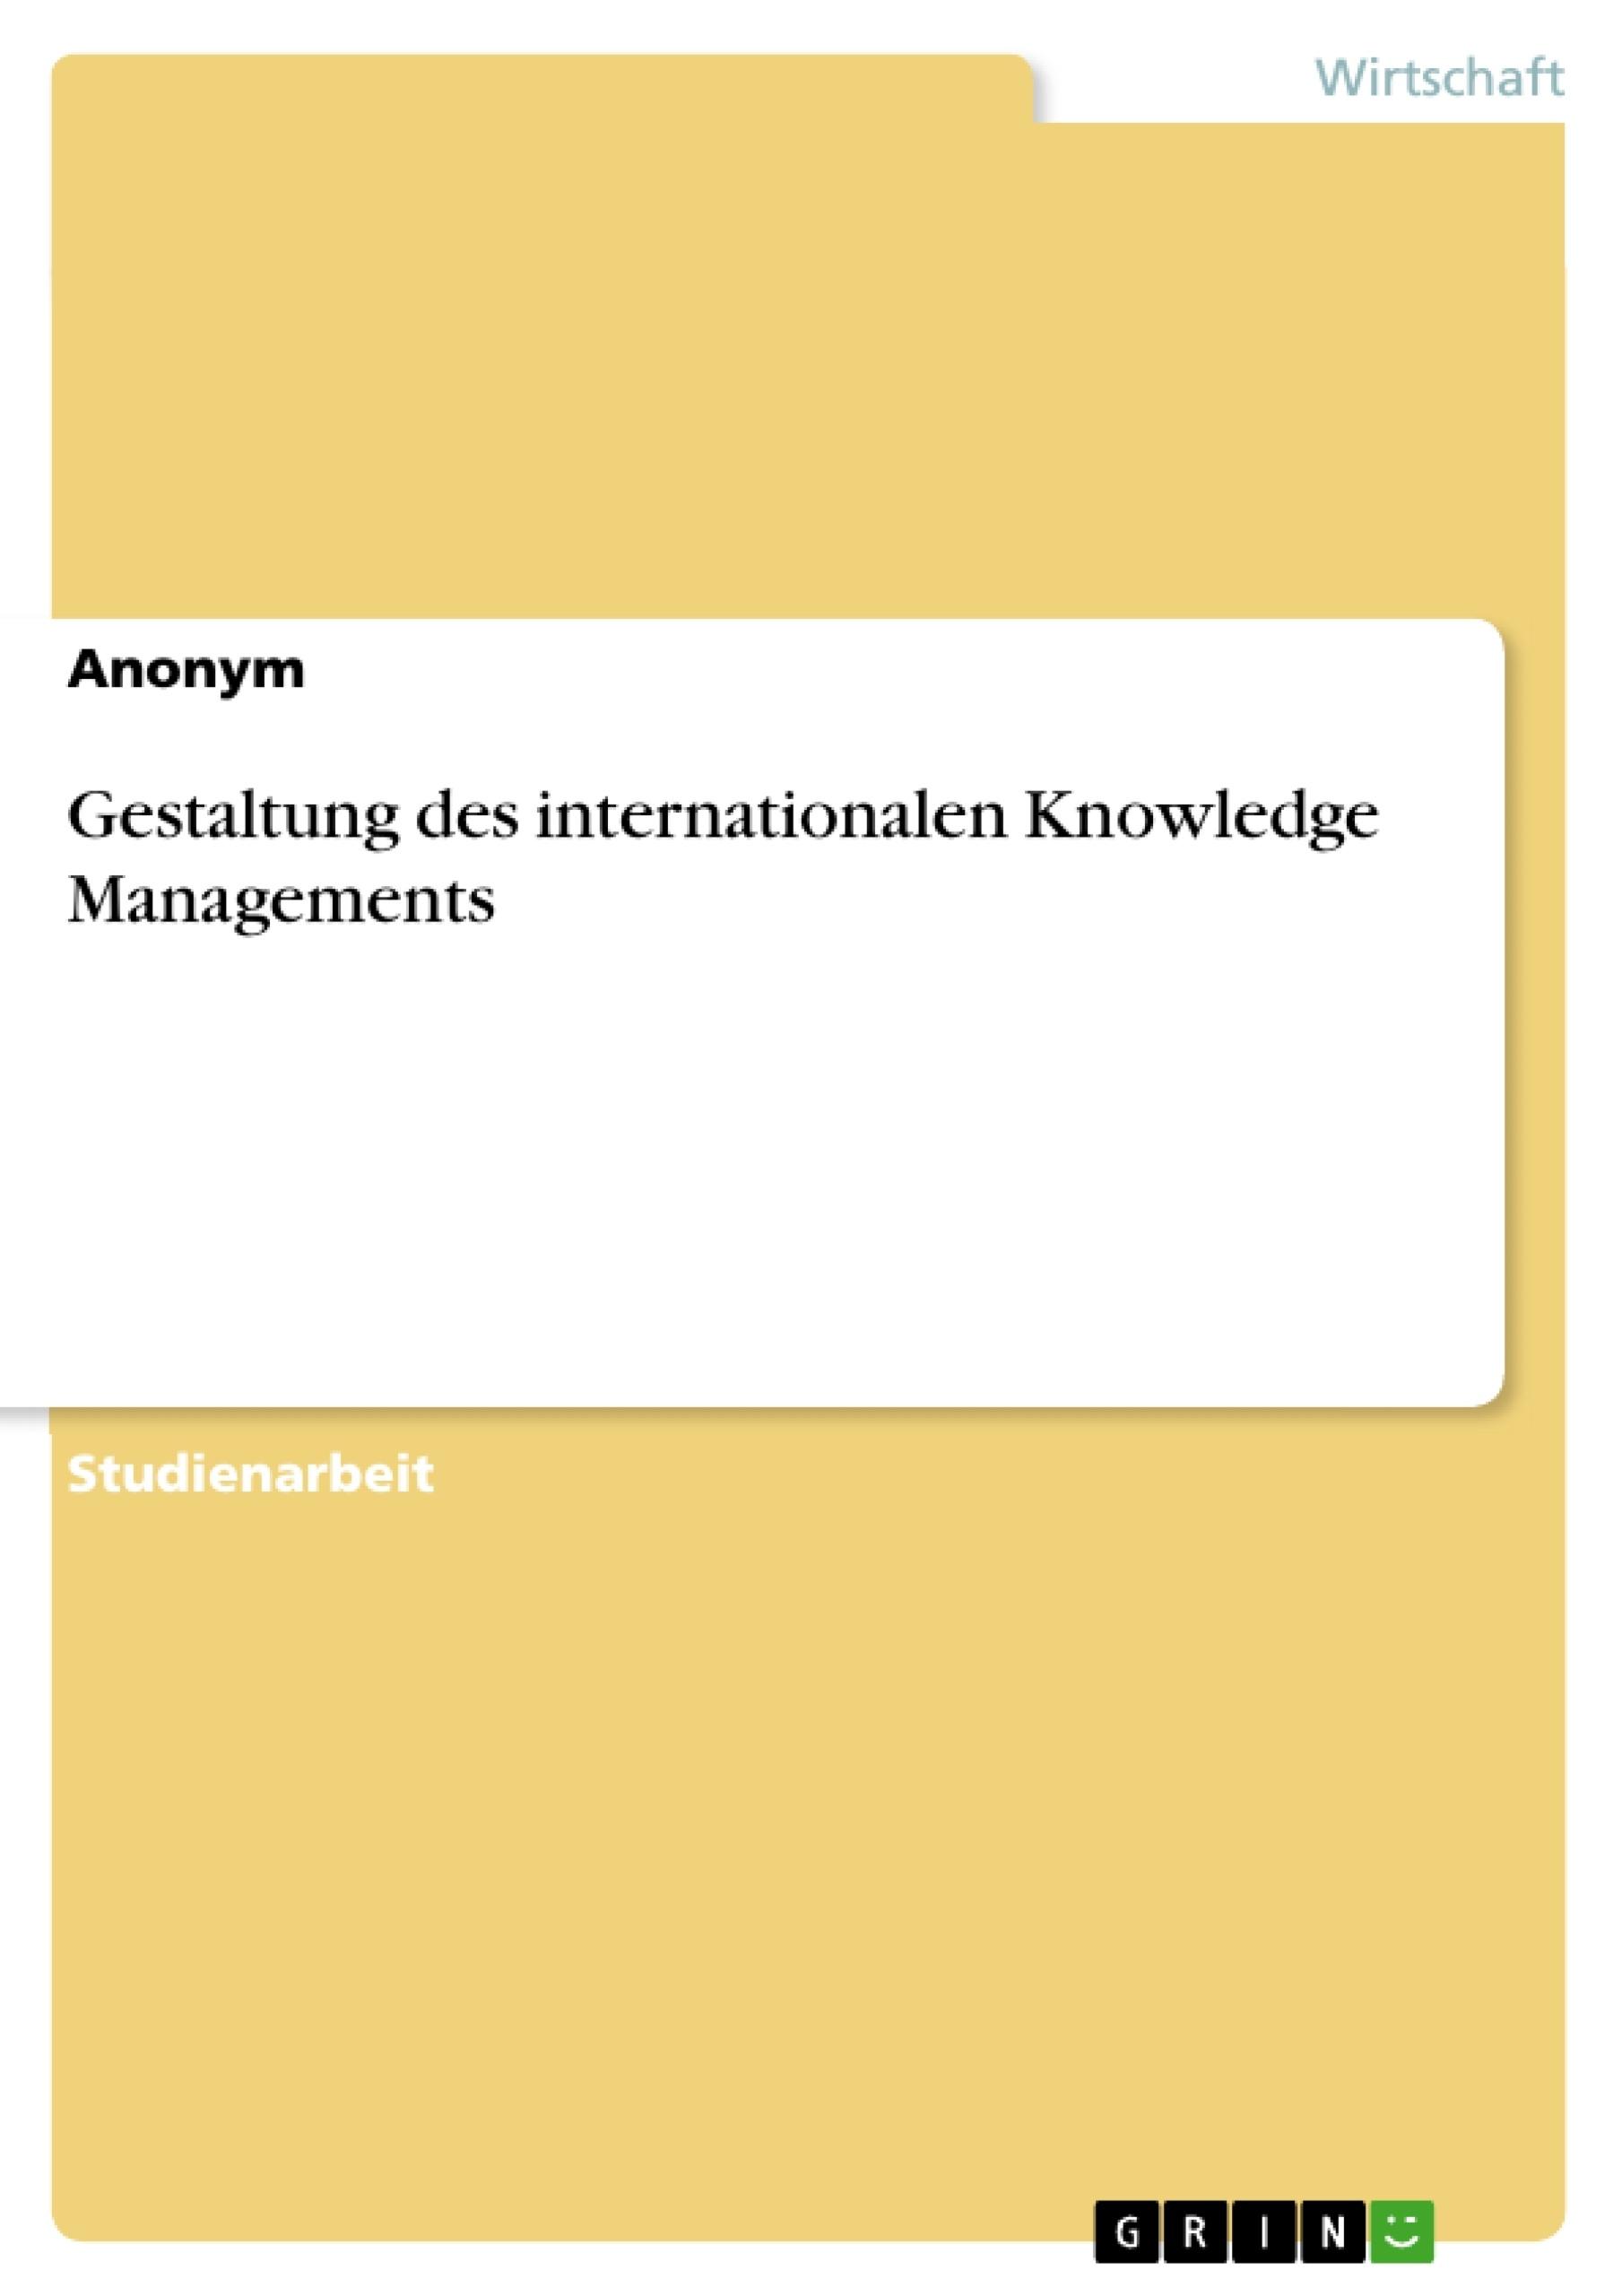 Organisation Case Study Essay Sample